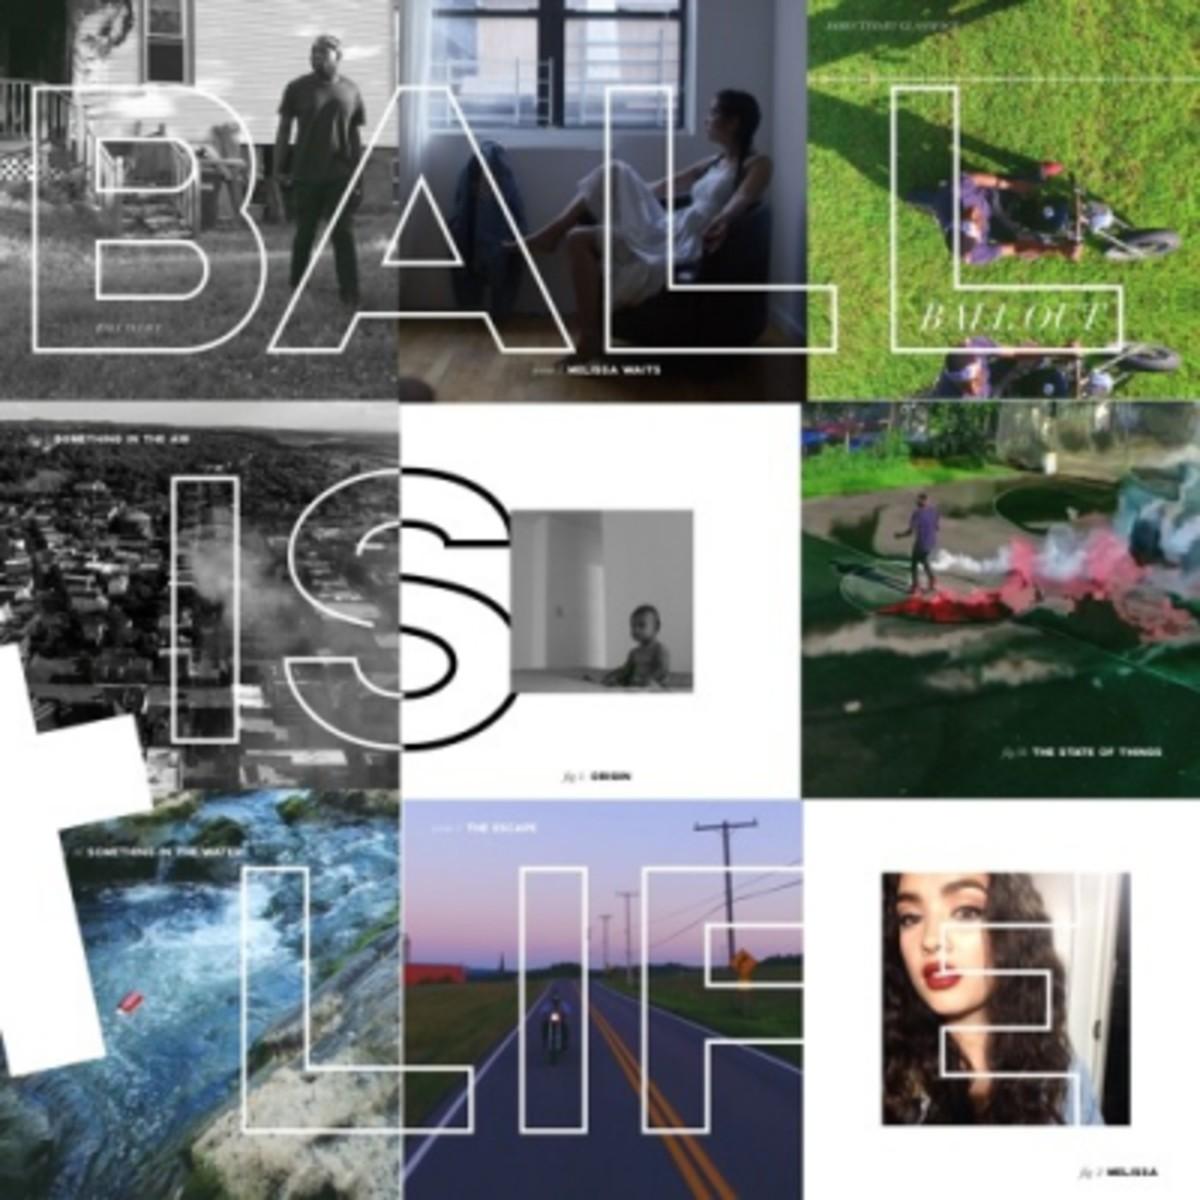 tunji-ige-ball-is-life.jpg